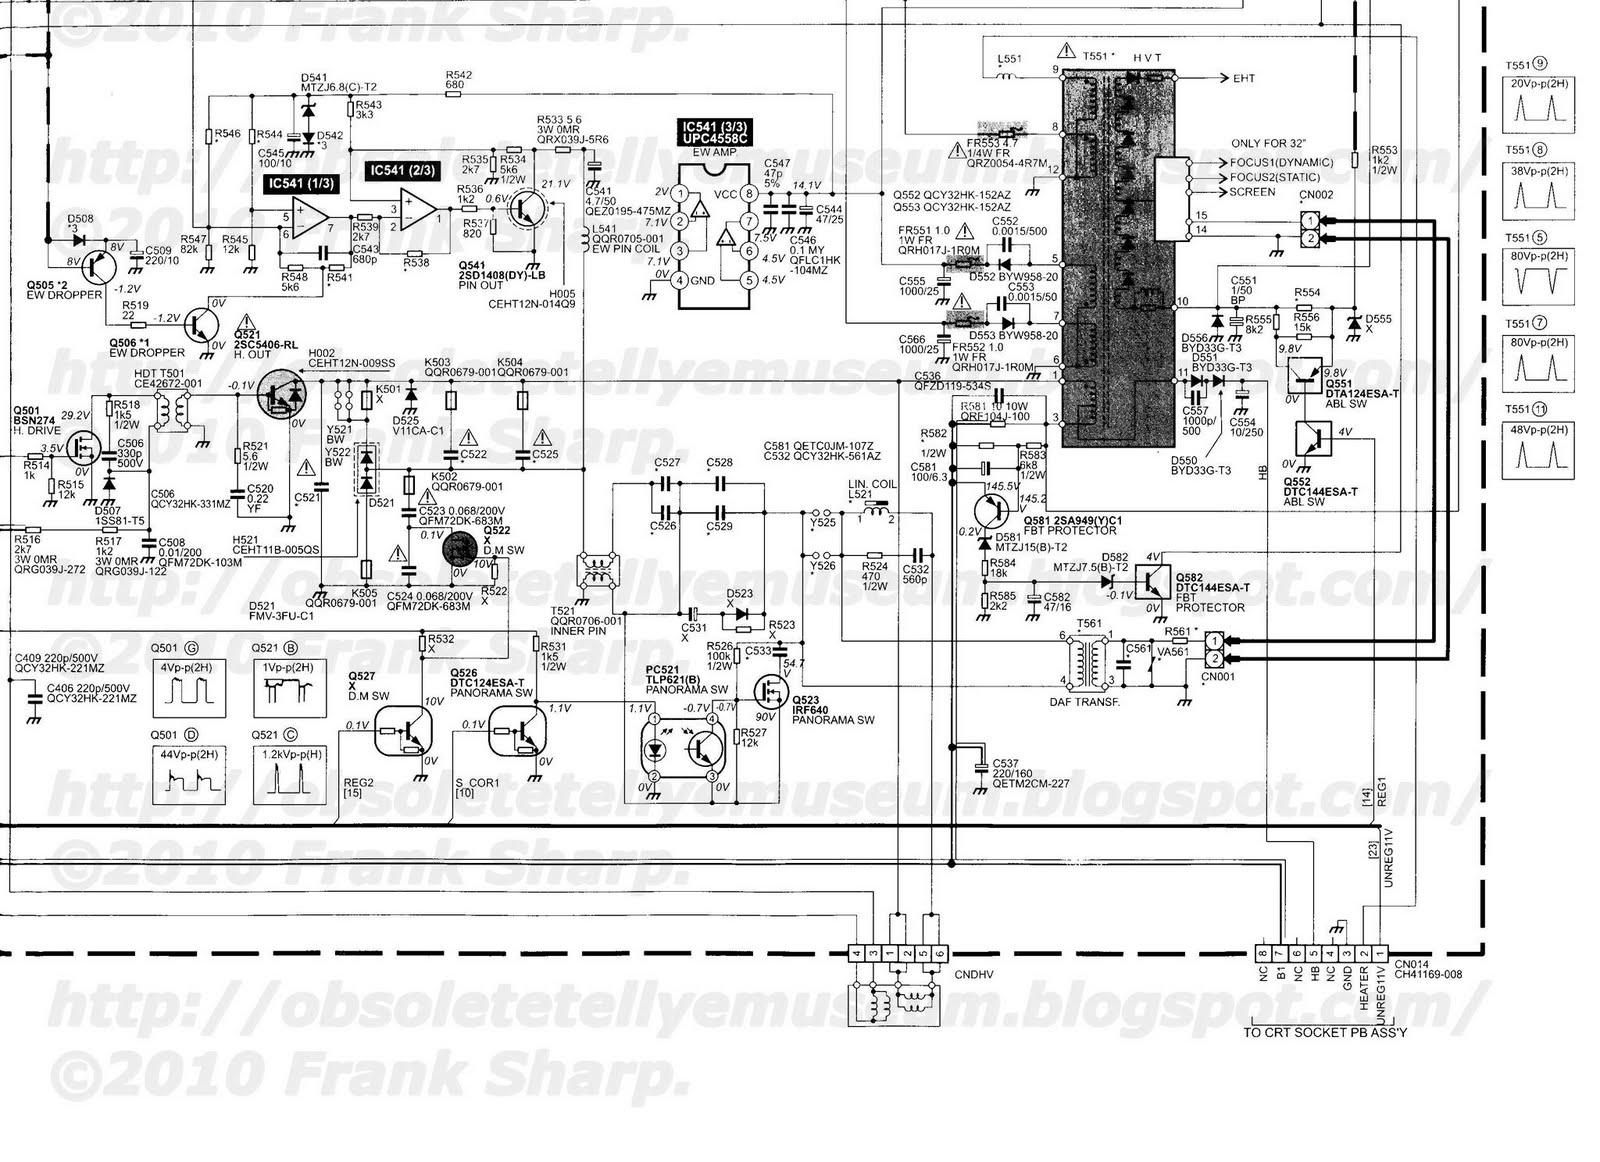 Obsolete Technology Tellye Jvc Av 32wp2en Chassis Mb Power And Panel Board Schematic Deflection Eht Smb 2001 U2